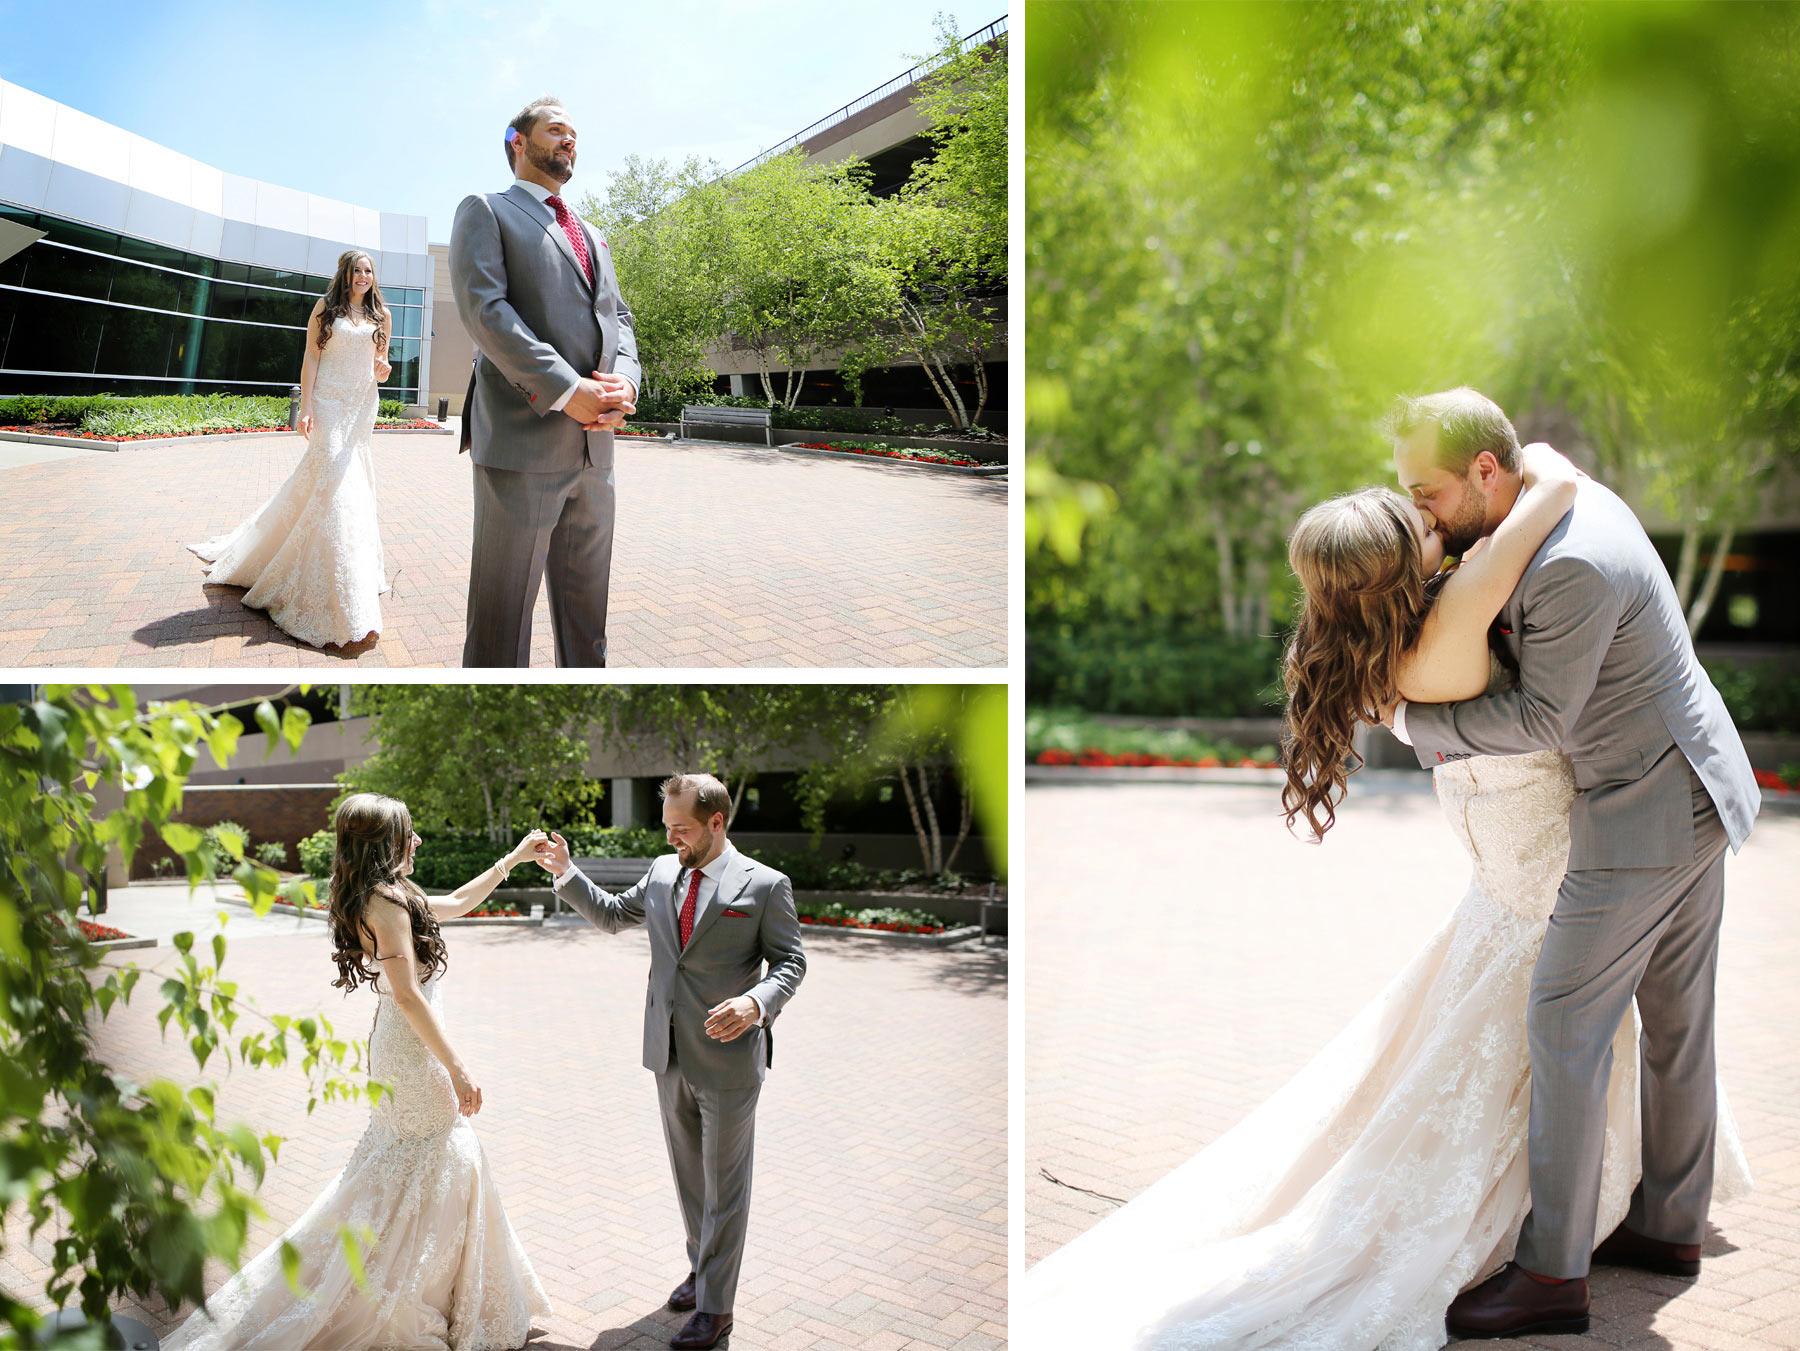 04-Minneapolis-Minnesota-Wedding-Photographer-by-Andrew-Vick-Photography-Summer-Edina-Westin-Hotel-First-Meeting-Look-Courtyard-Groom-Bride-Kiss-Twirl-Dress-Natalie-and-Andrew.jpg